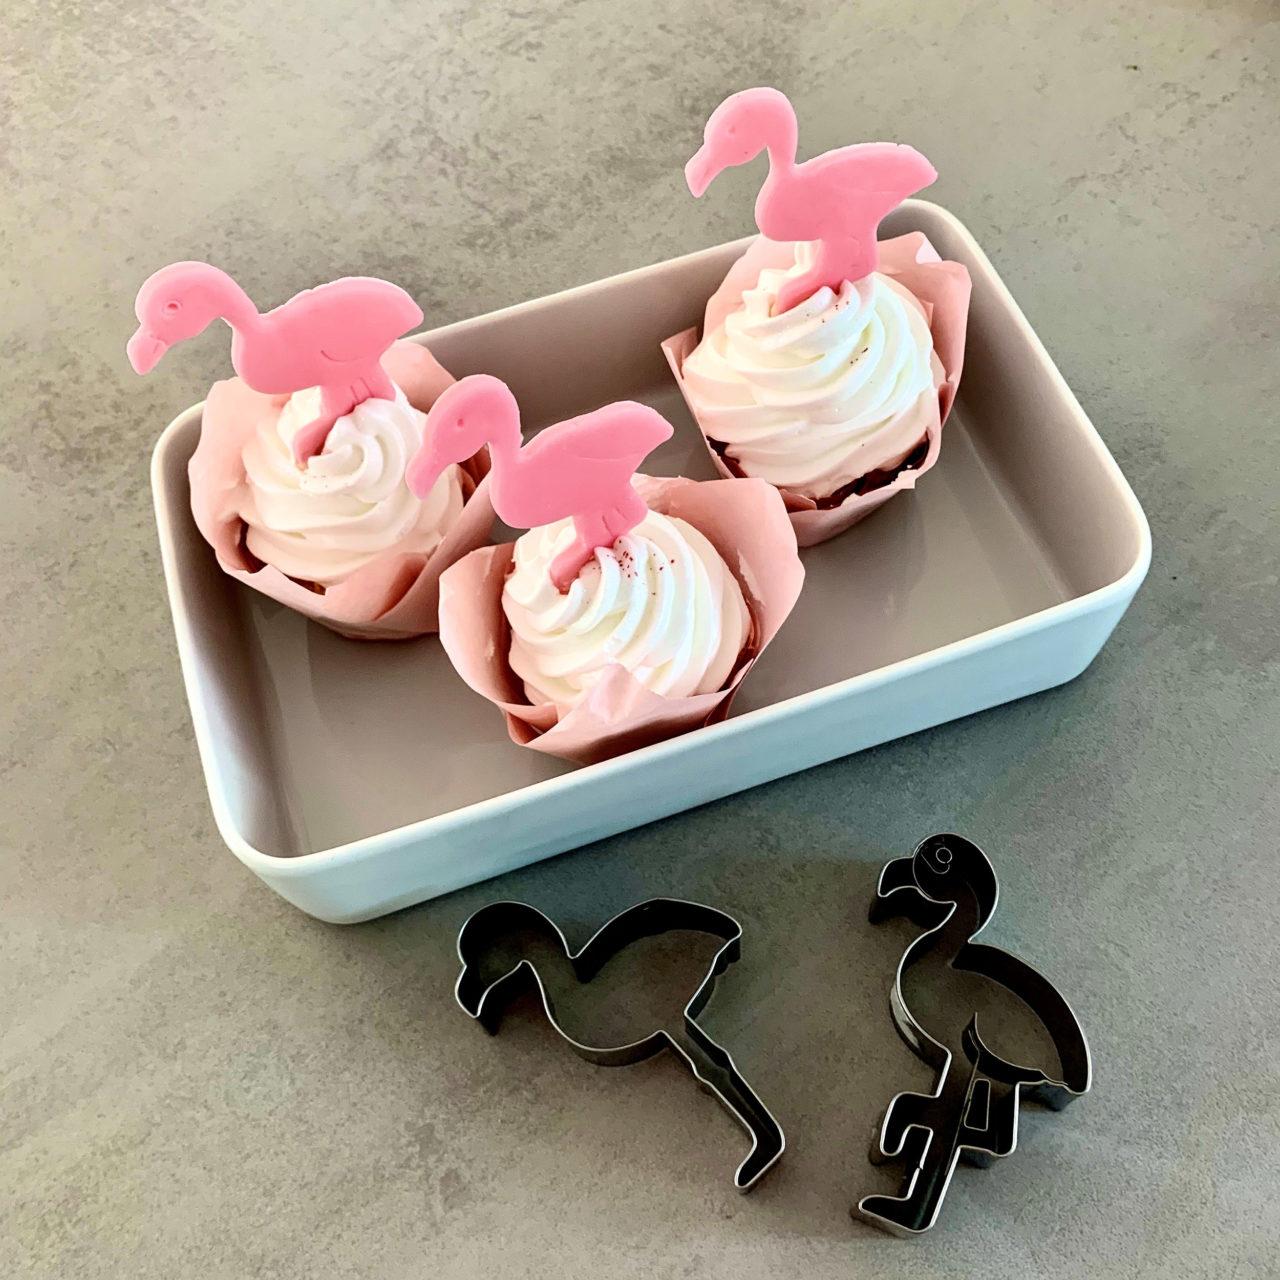 Köln Beste Leckerchen Flamingo Cupcakes 3